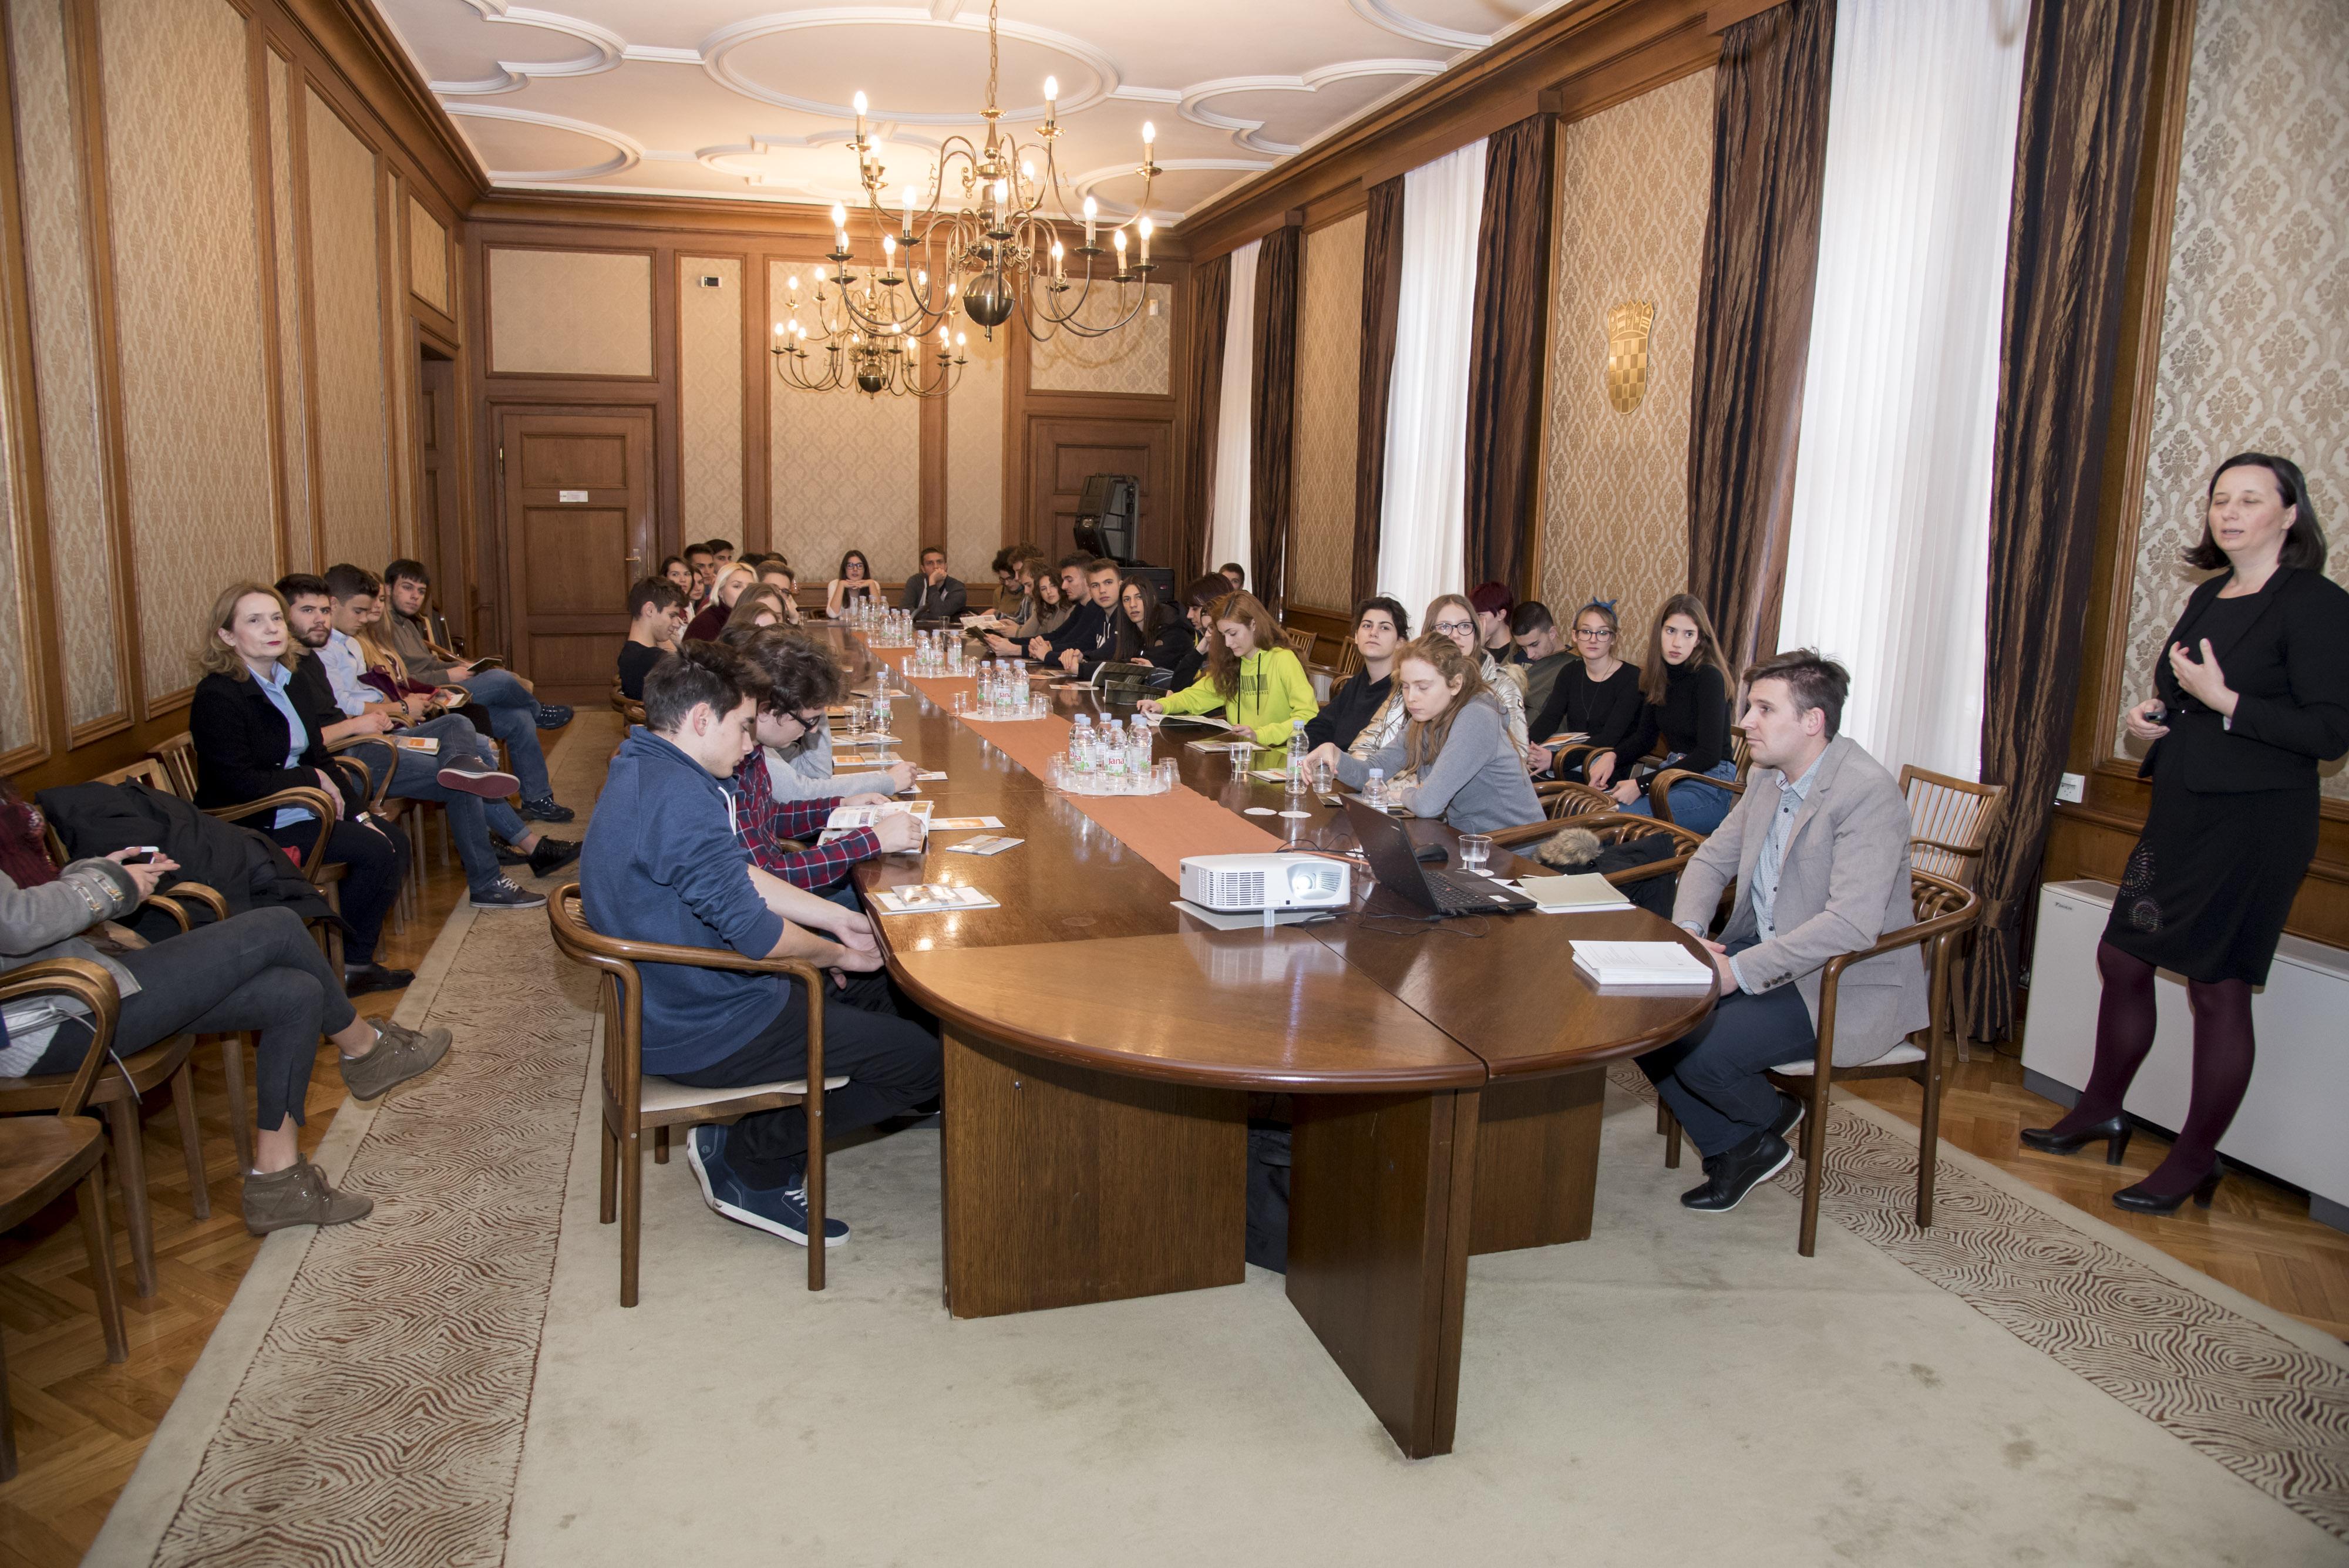 Sporazum o suradnji između FER-a i XV. gimnazije - XV